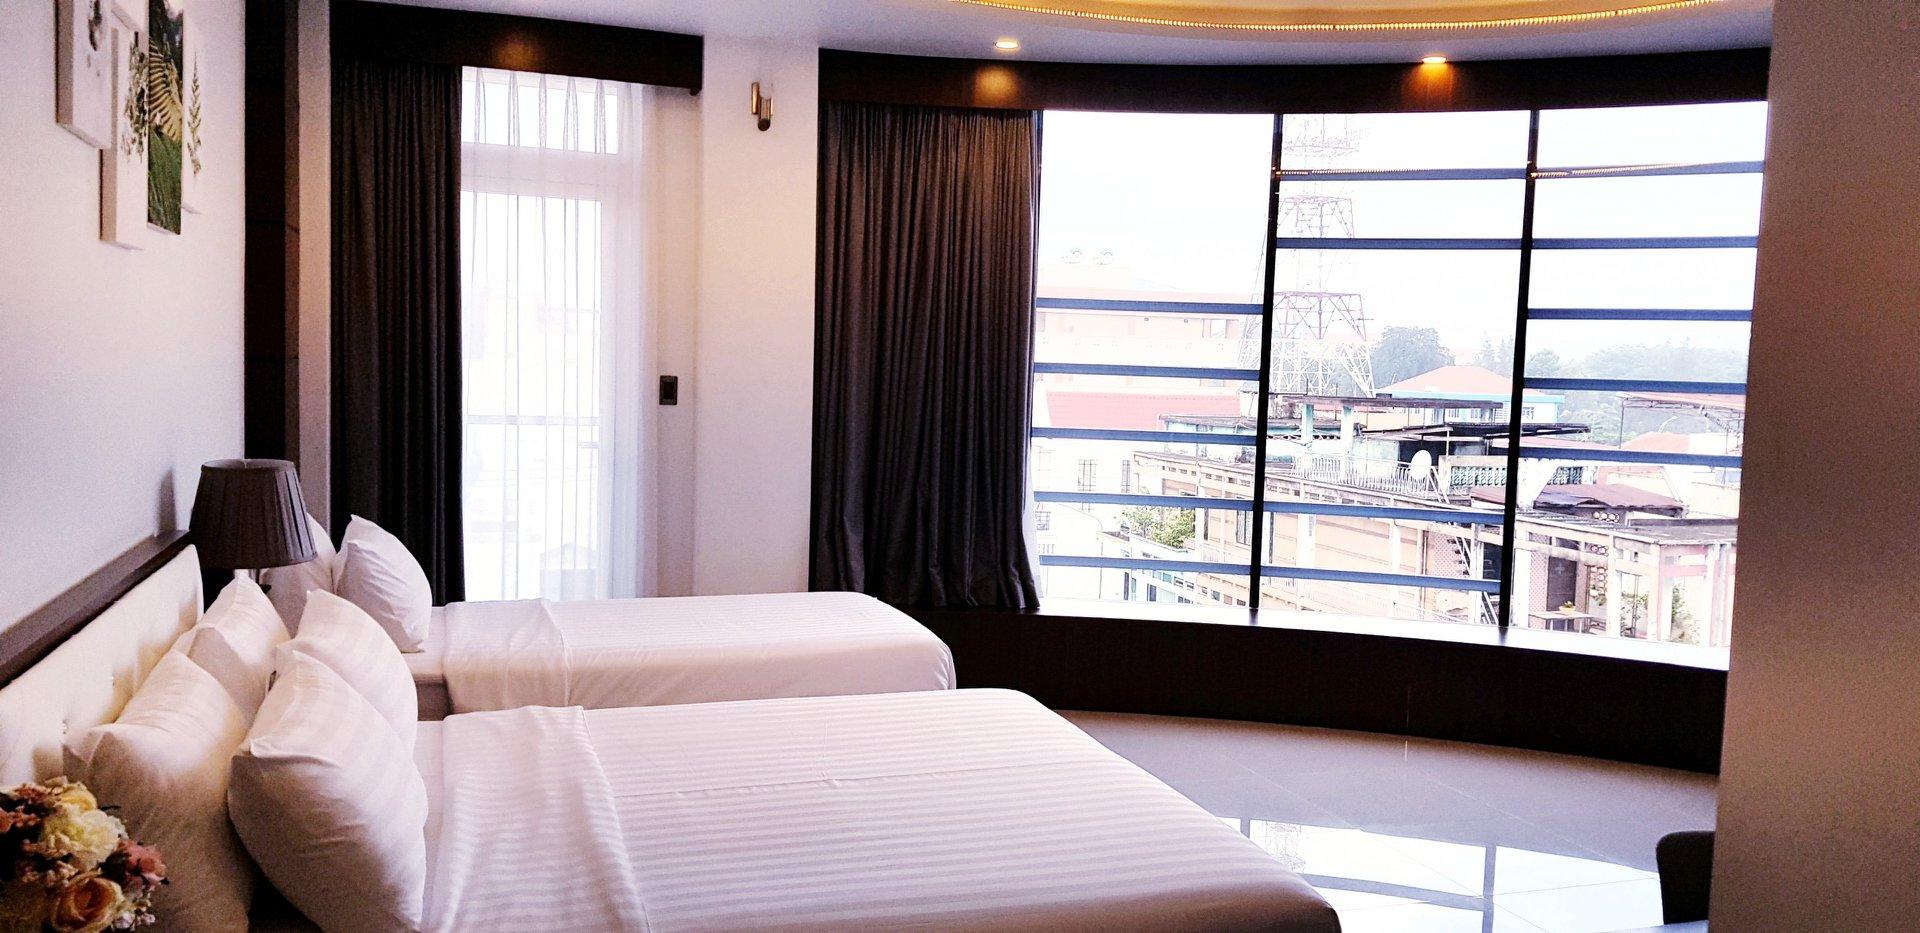 Quoc Thanh Hotel - khach san o Long Khanh